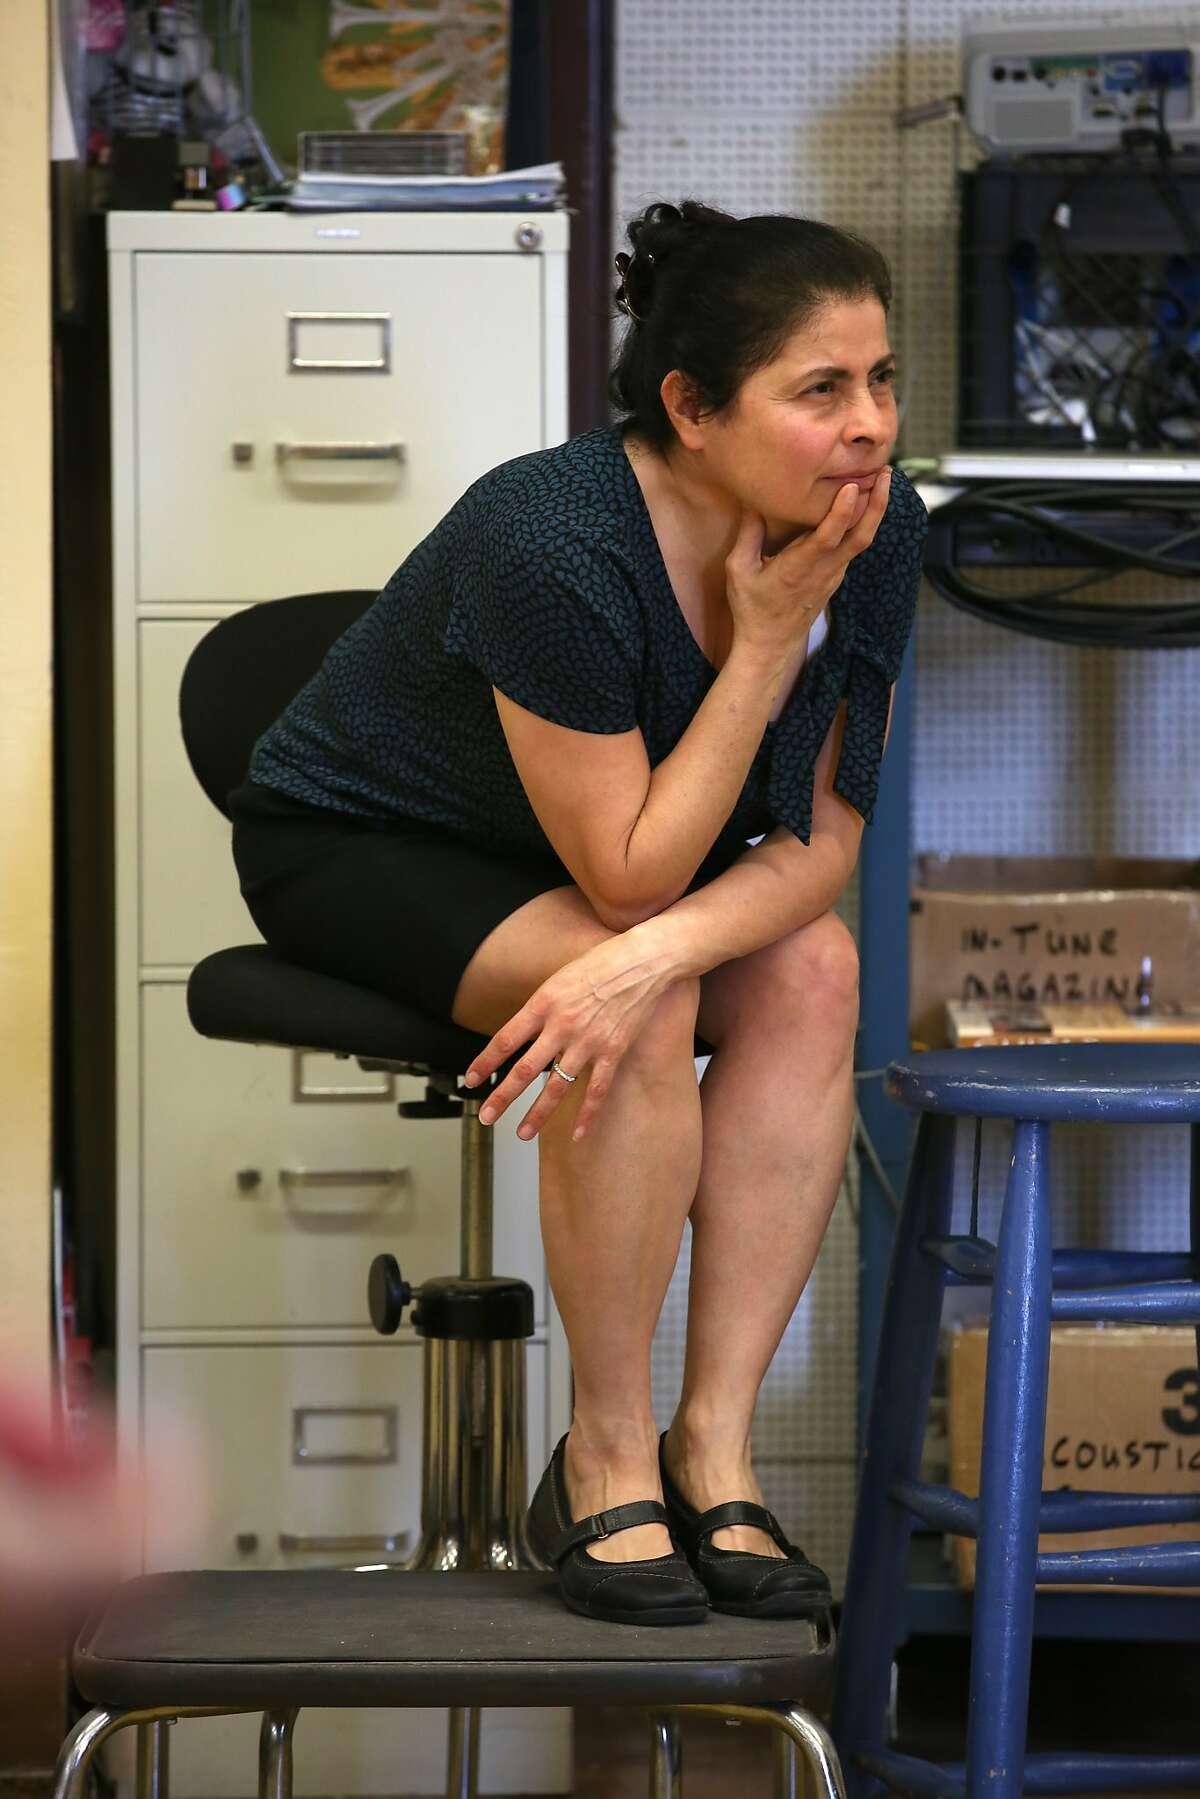 Drama teacher Myrna Maroun watches students do improvisation in the Little Theater at Galileo High School in San Francisco, California, on Thursday, February 25, 2016.